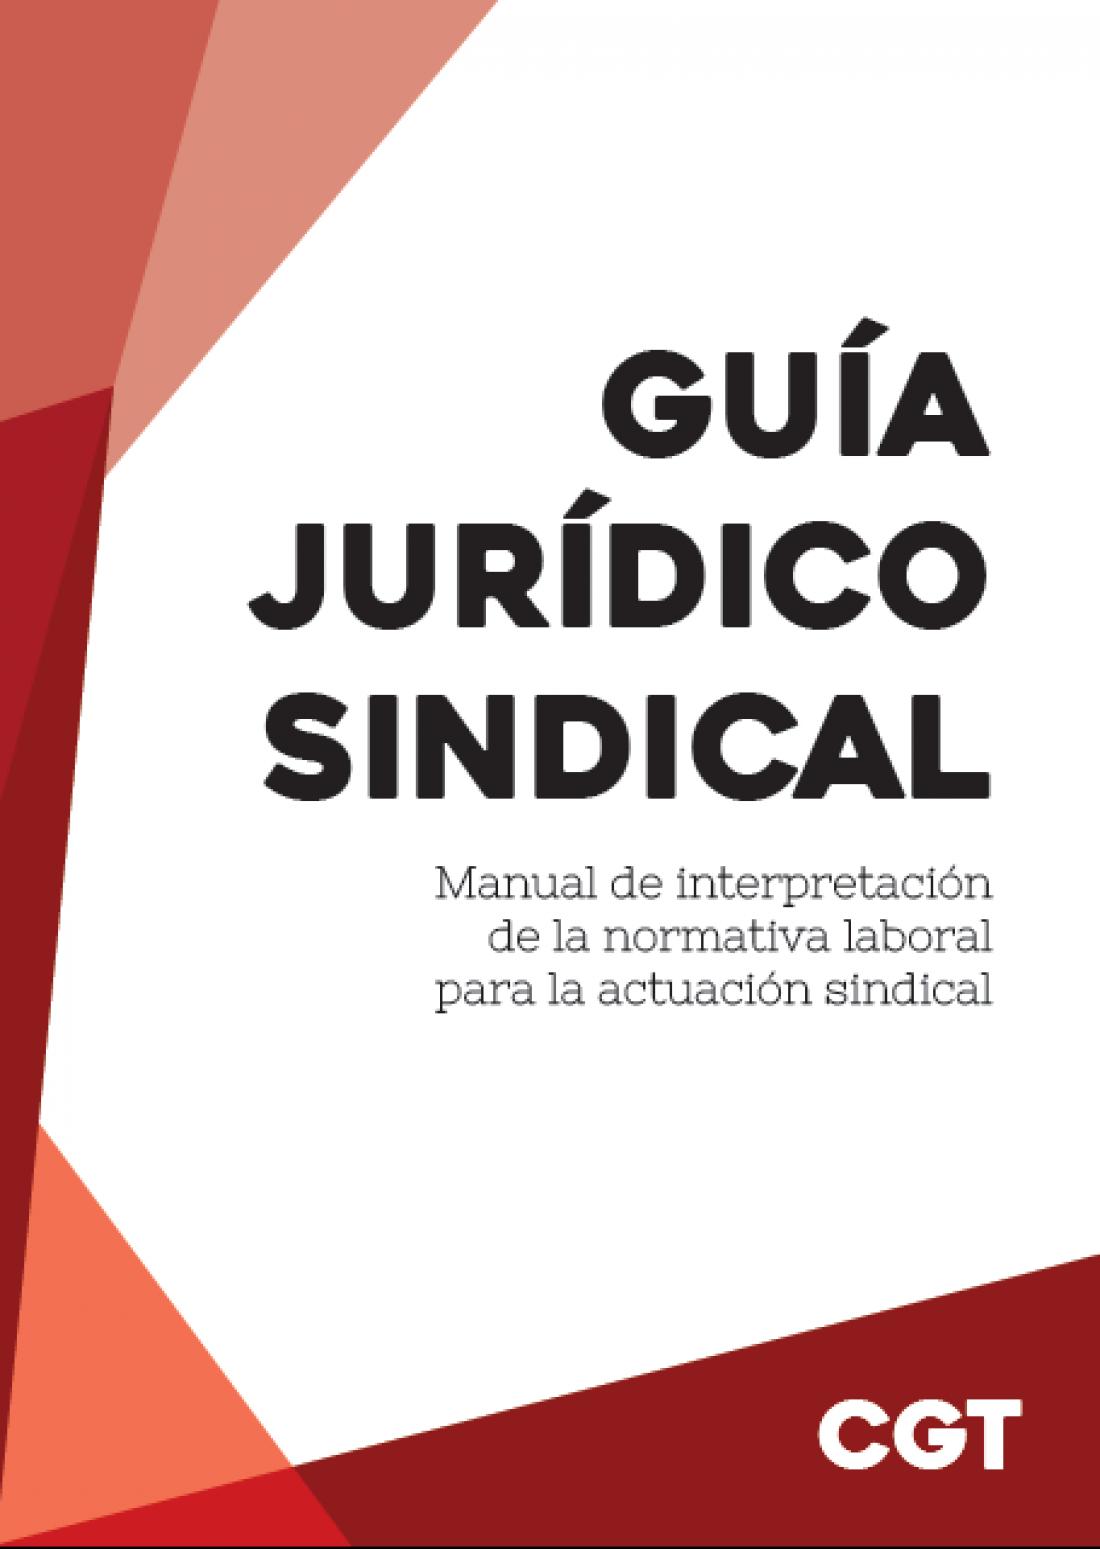 Guía Jurídico Sindical 2017 – CGT